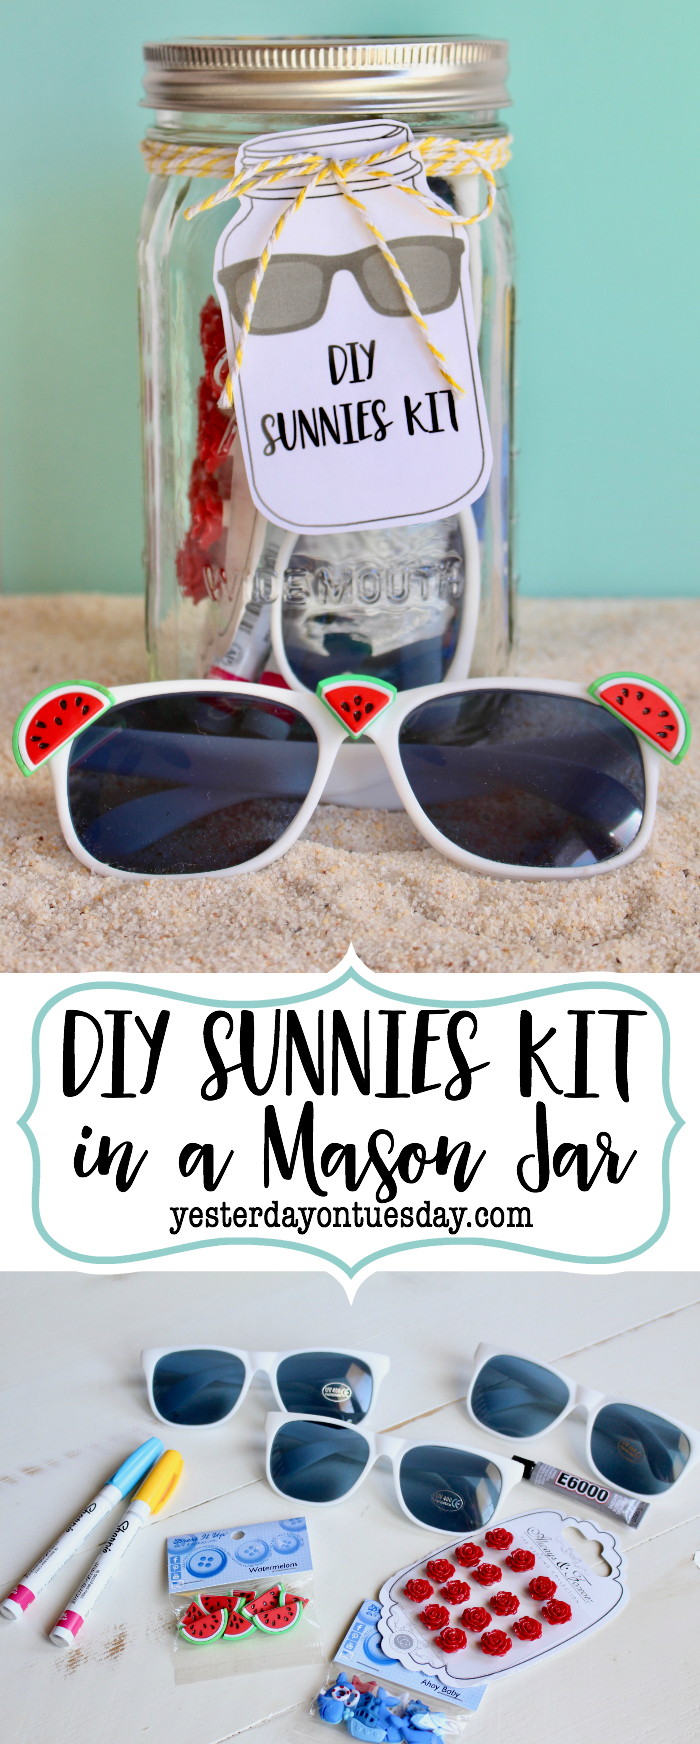 DIY Sunglasses Kit in a Mason Jar